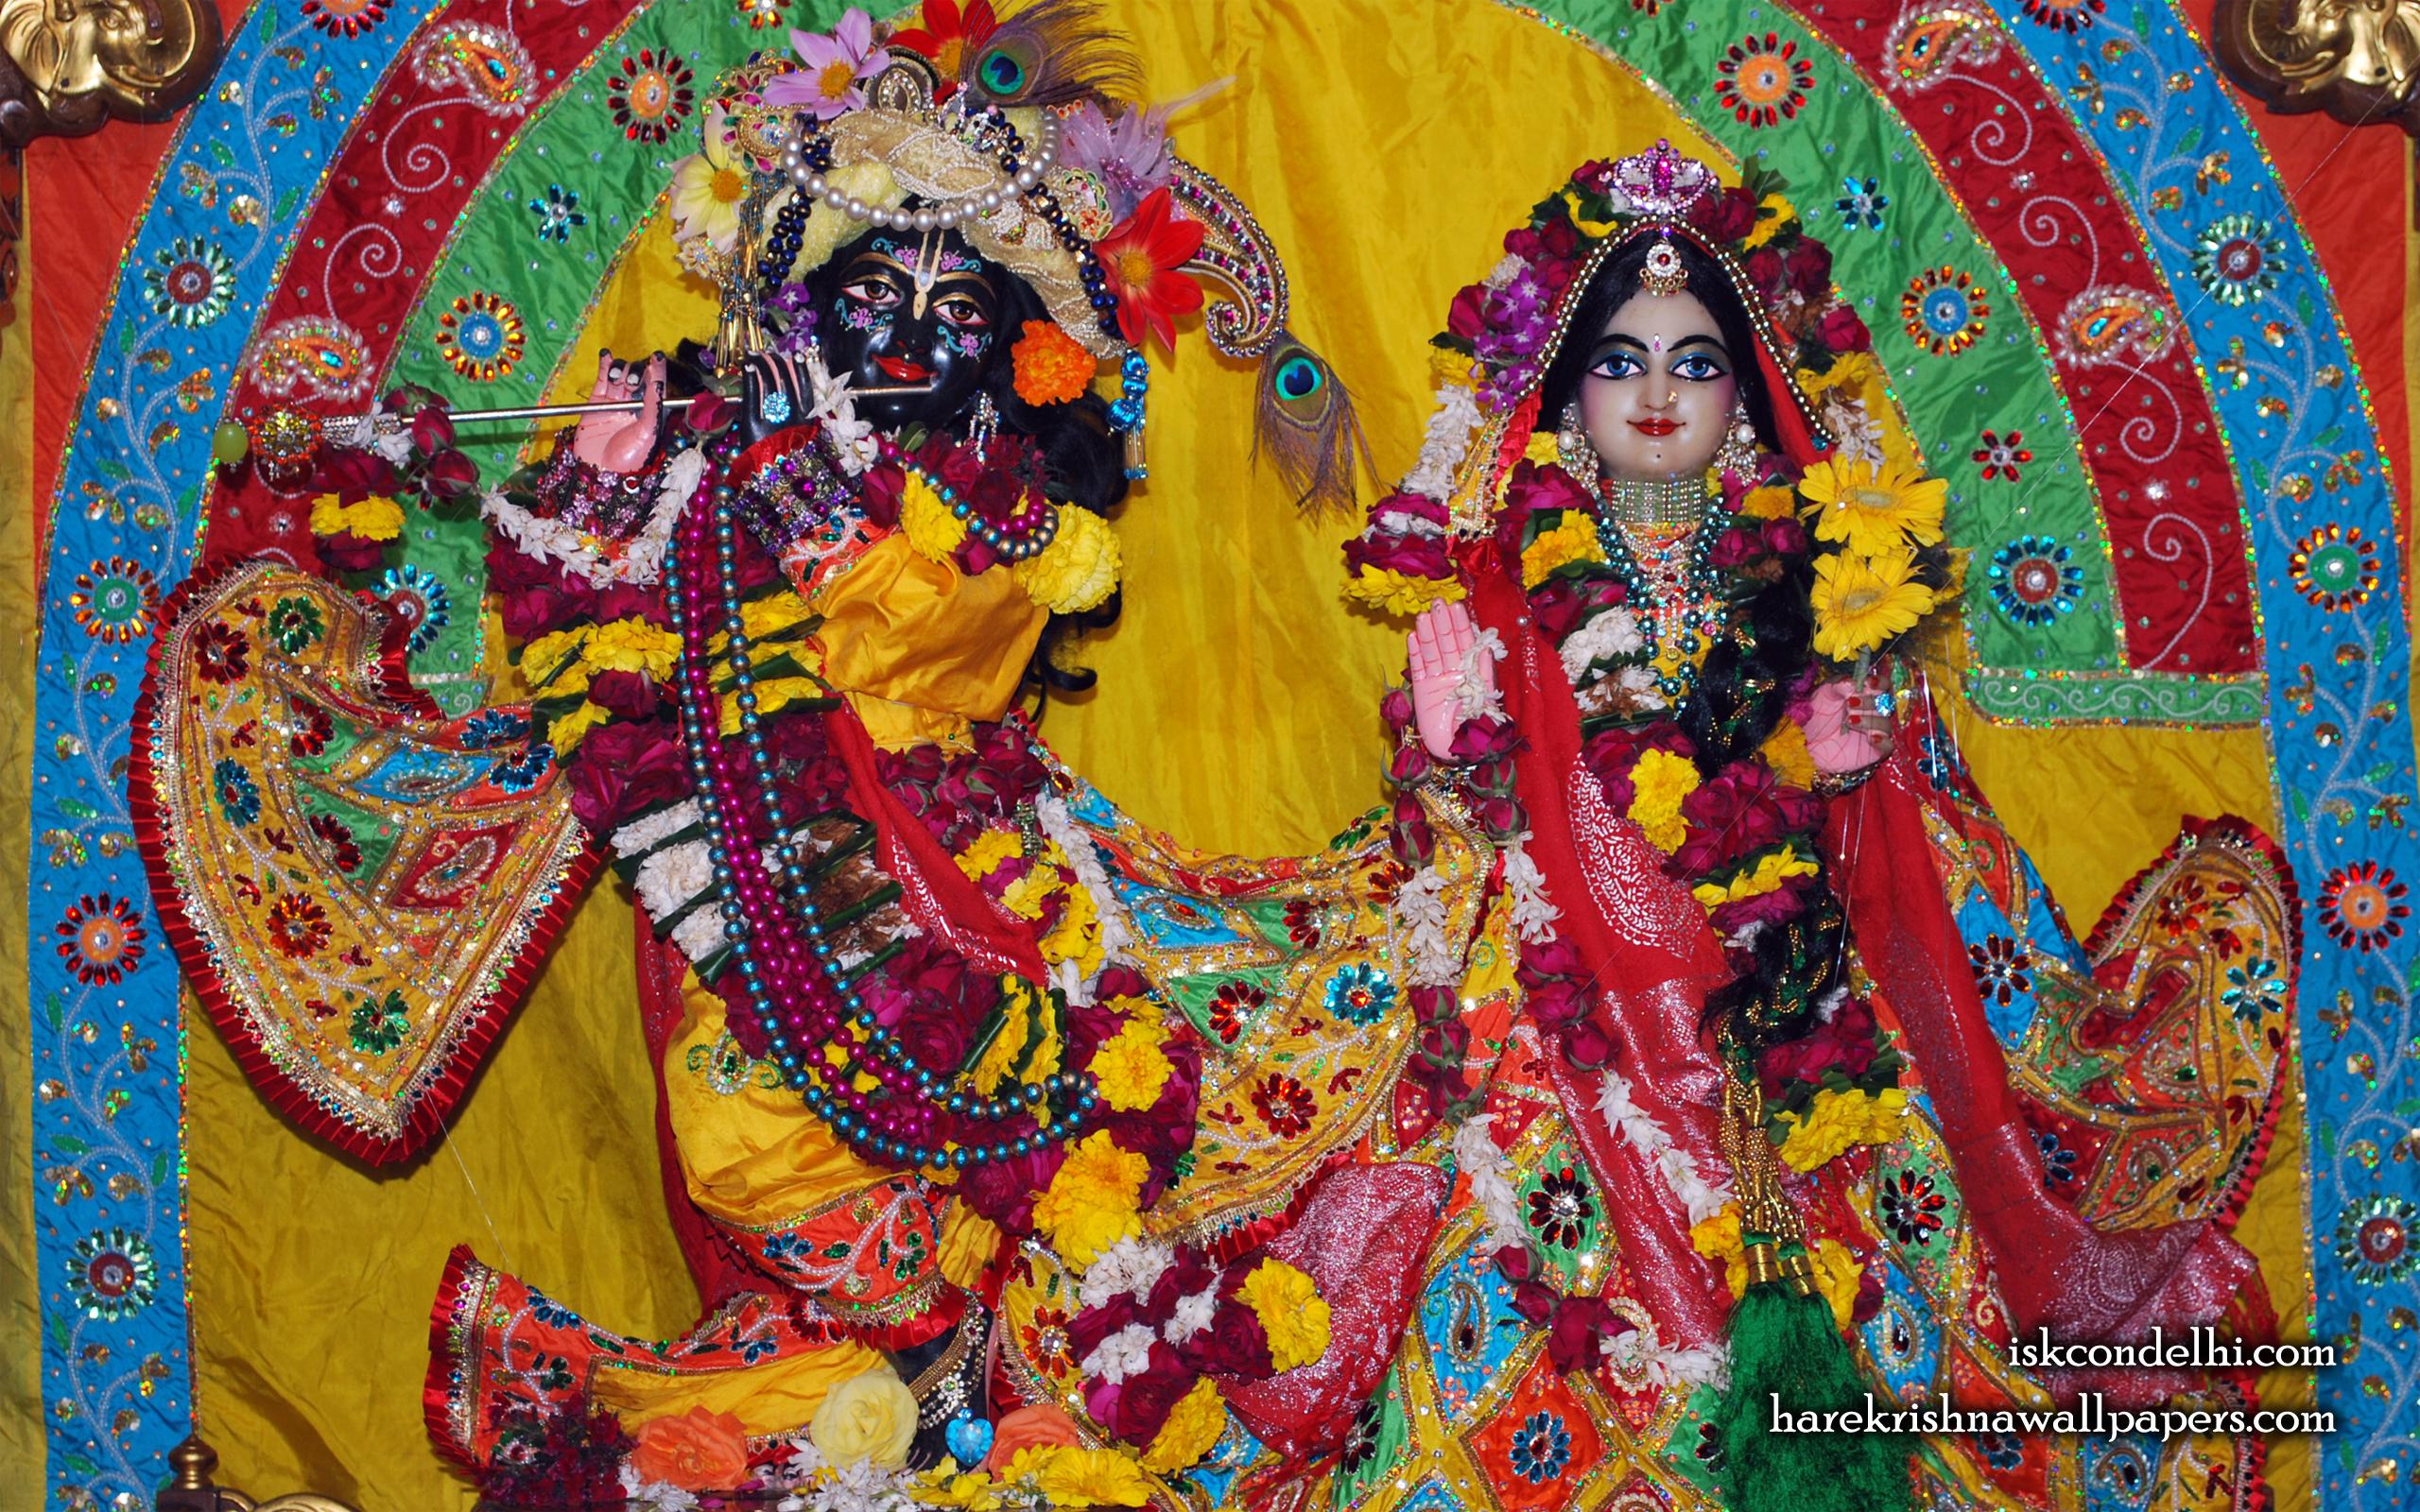 Sri Sri Radha Parthasarathi Wallpaper (011) Size 2560x1600 Download